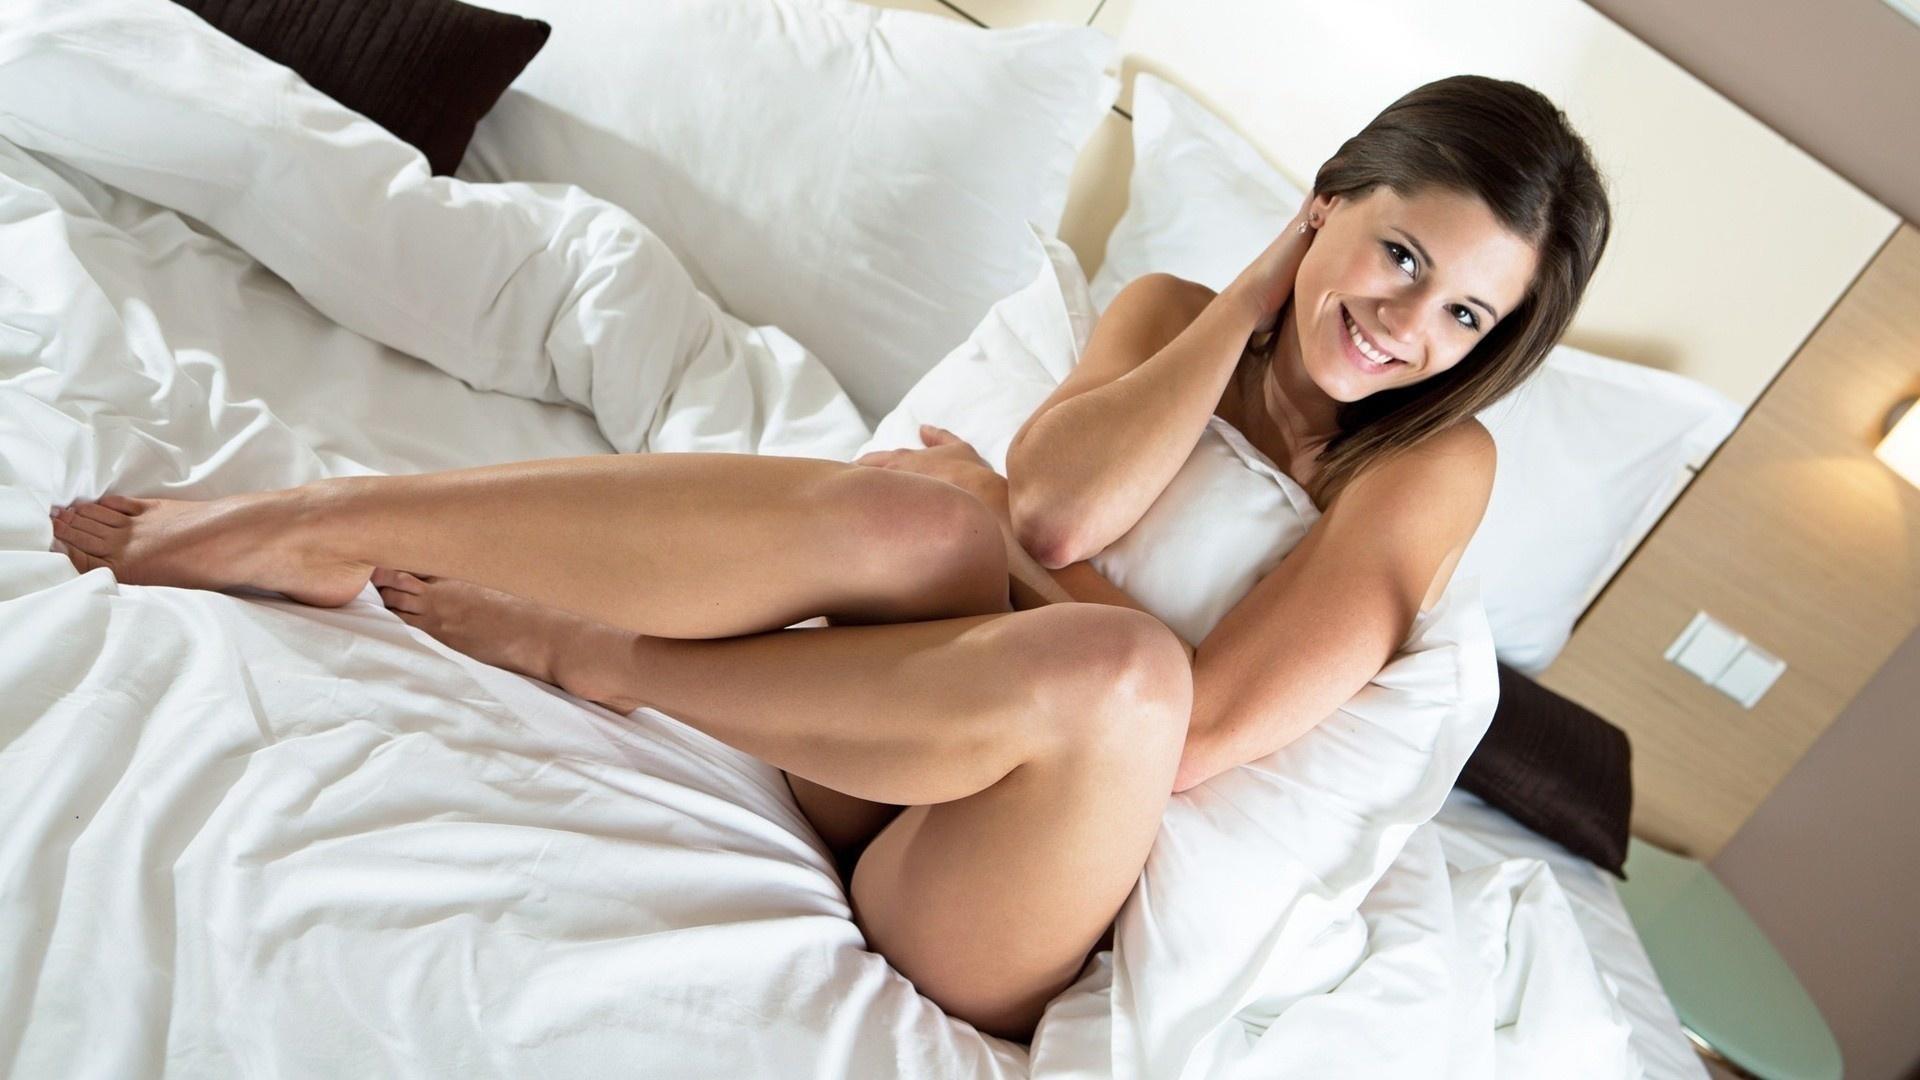 muzhskoy-porno-foto